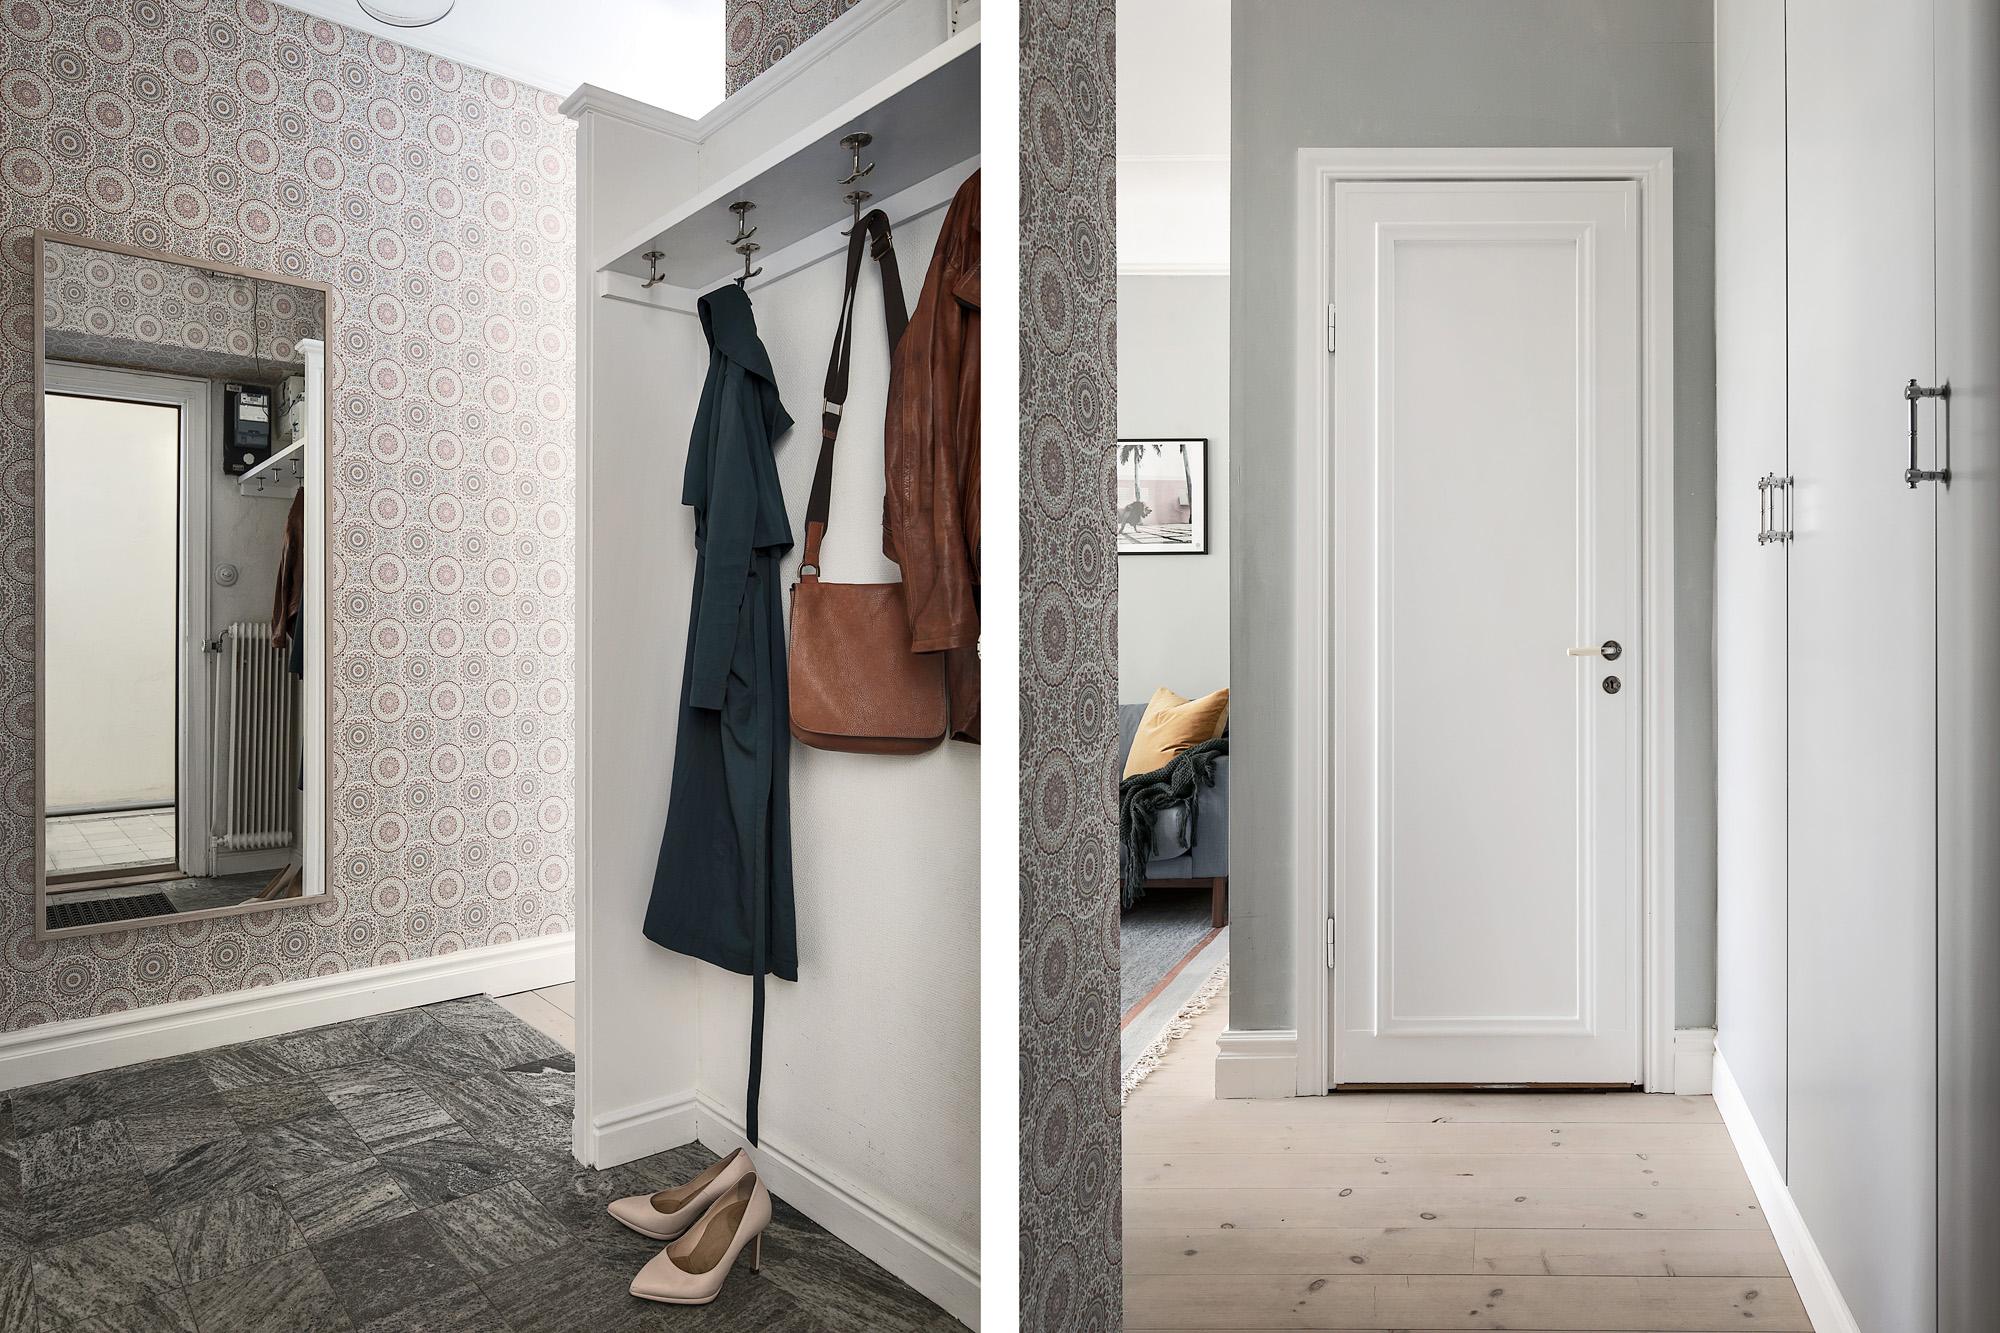 прихожая зеркало шкаф коридор одежда дверь обои